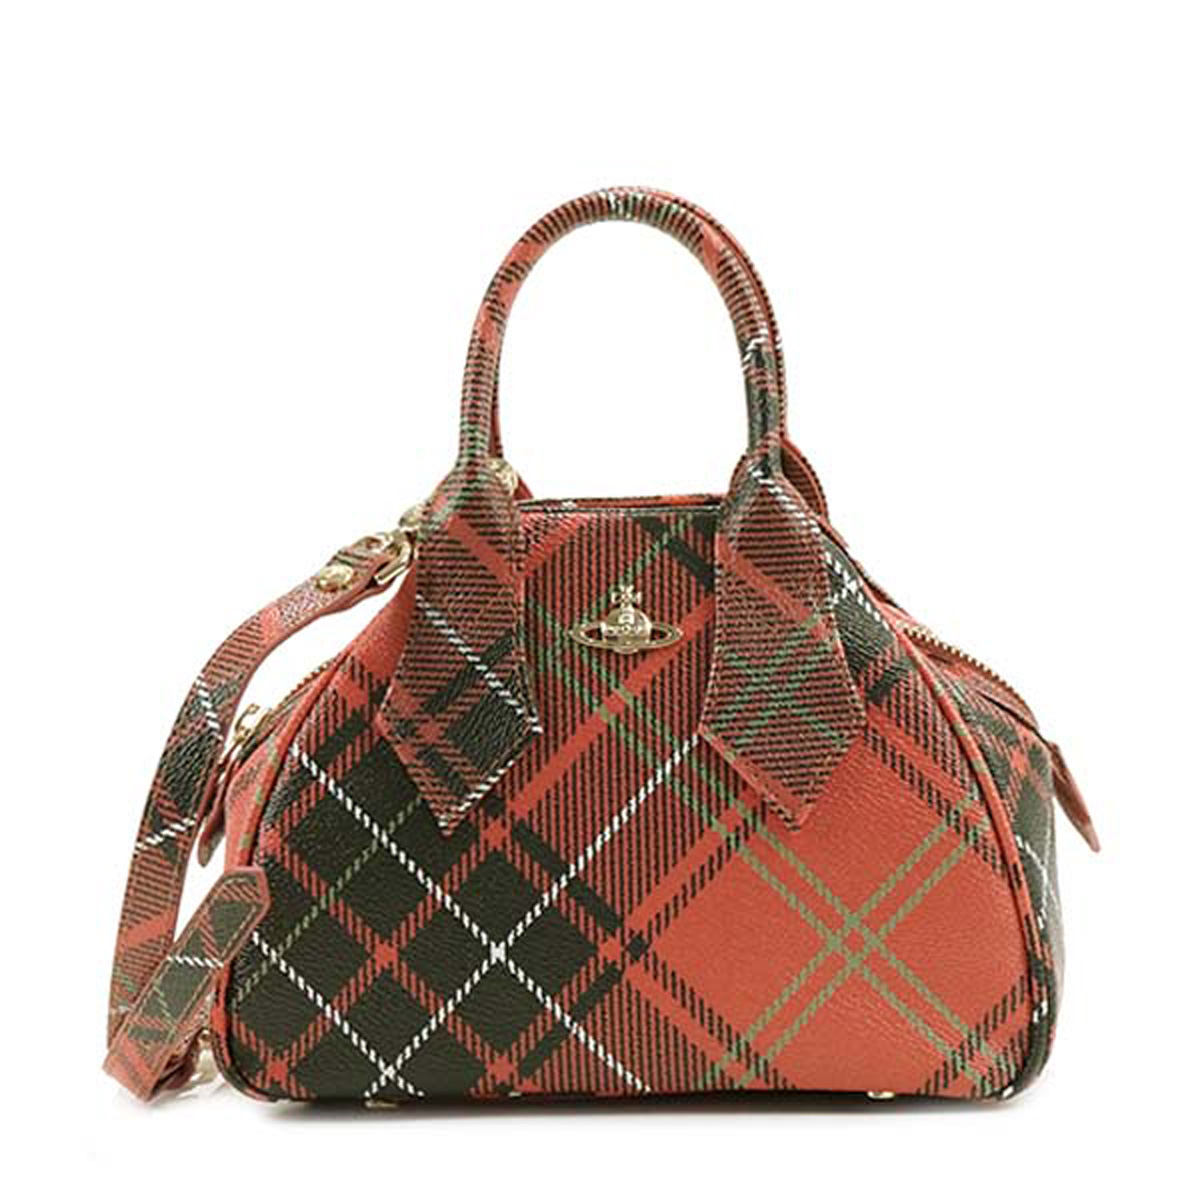 efdf08664c It is shoulder bag CHARLOTTE red system tartan checked pattern at Vivien  waist Wood Vivienne Westwood ...